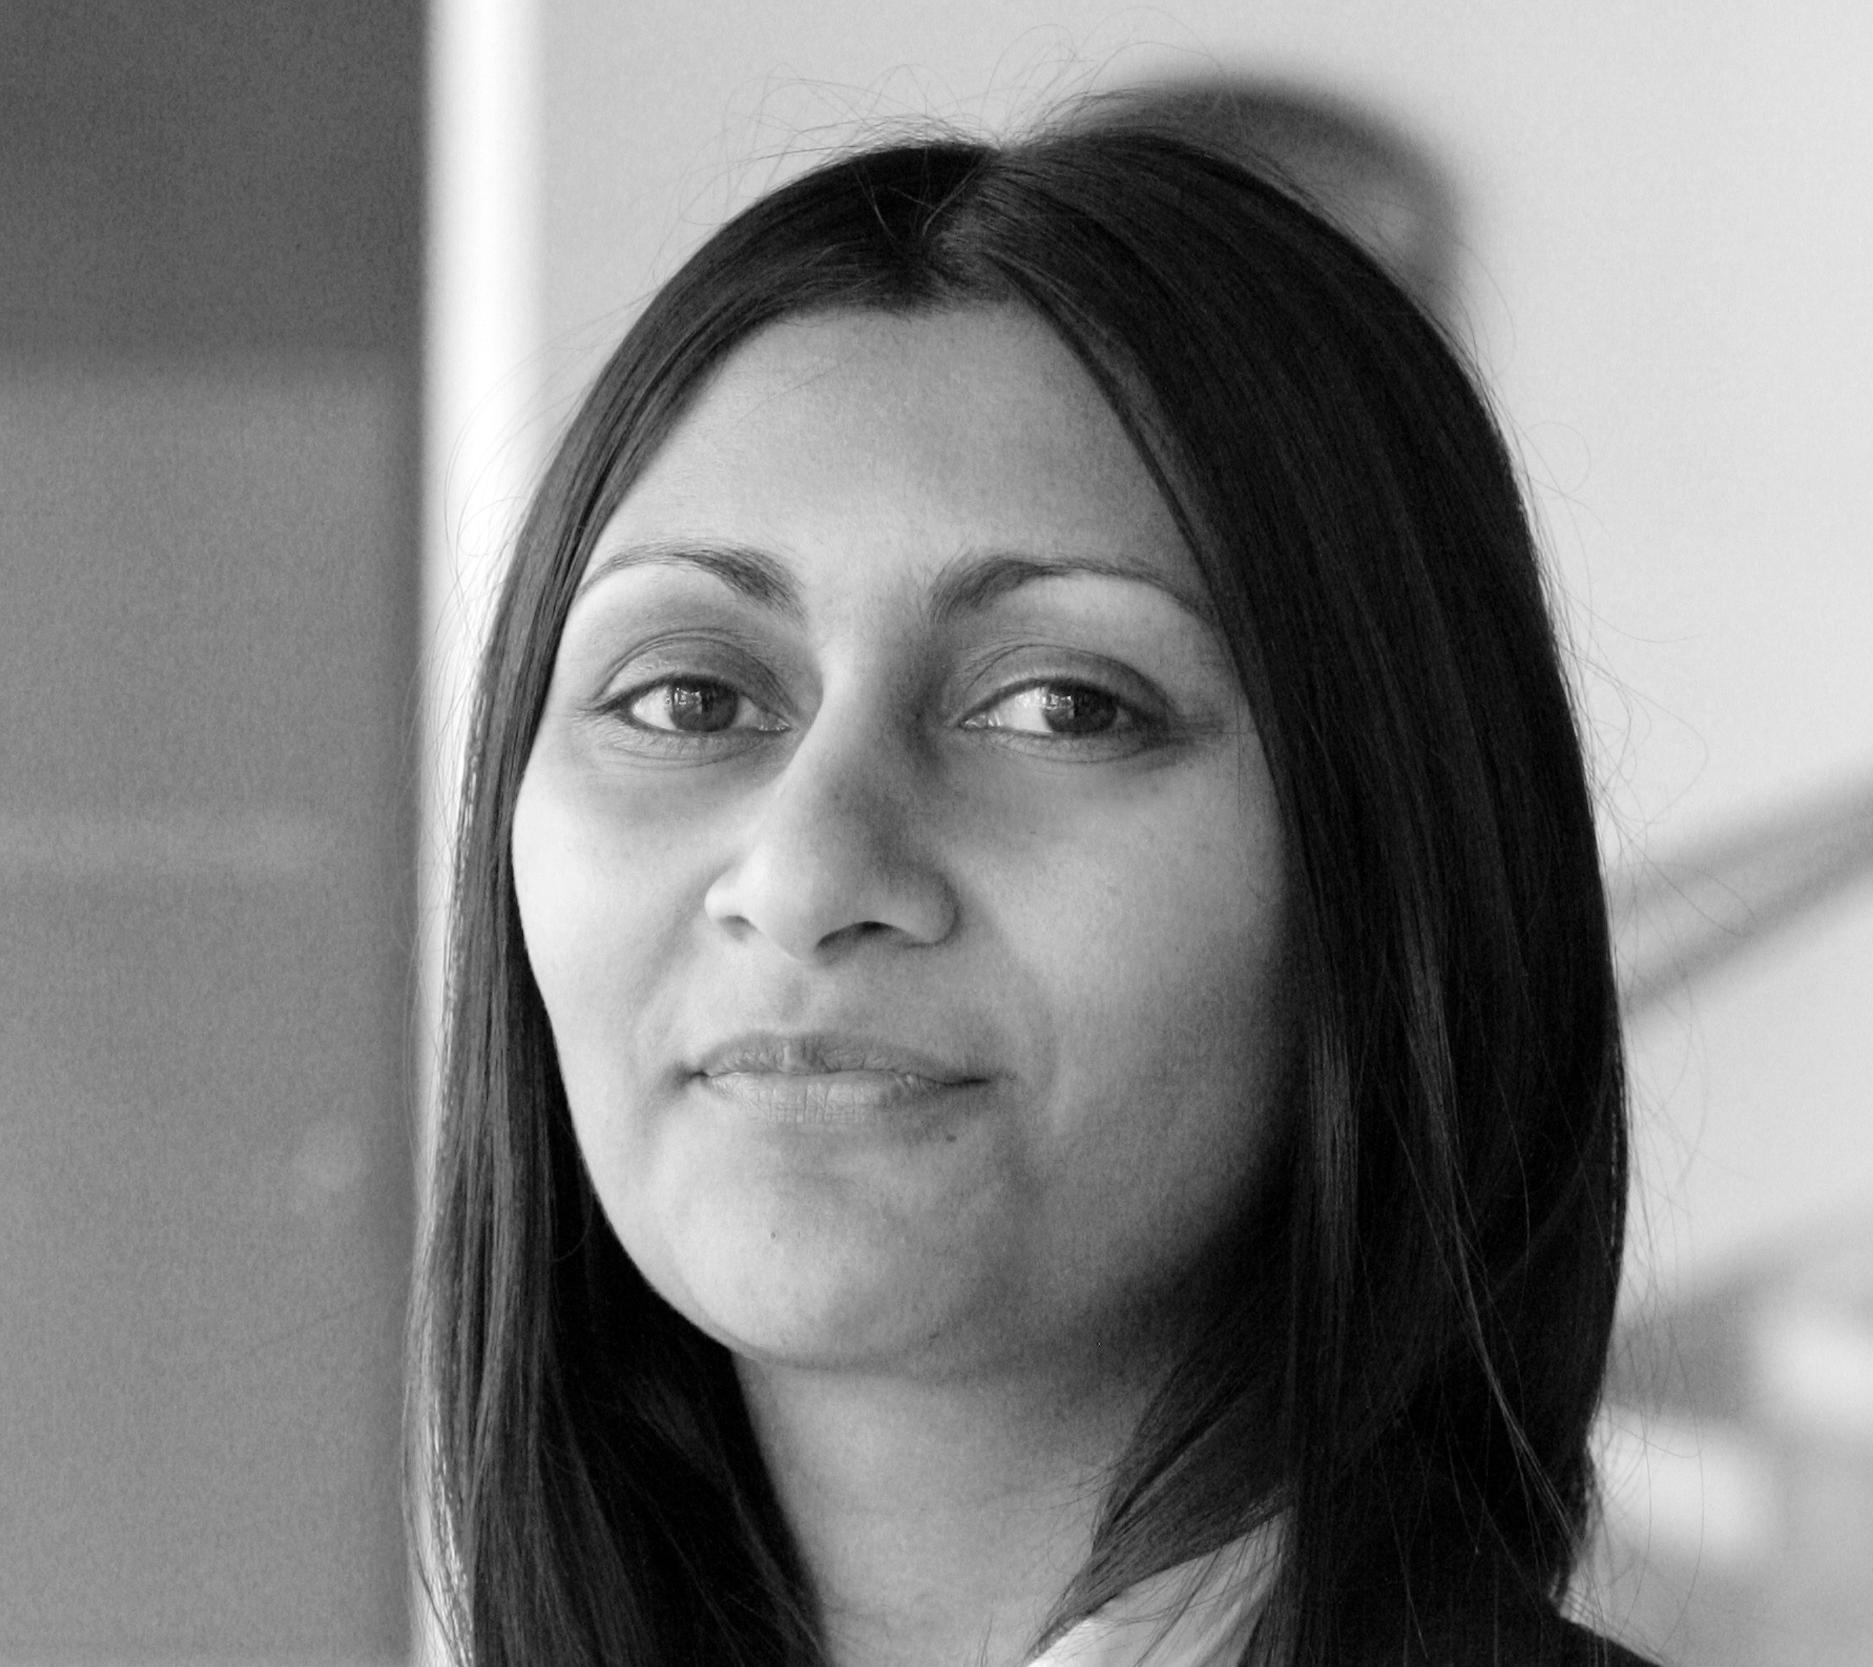 Prina Shah, Portrait, Aus Glass Conference 2015.jpg